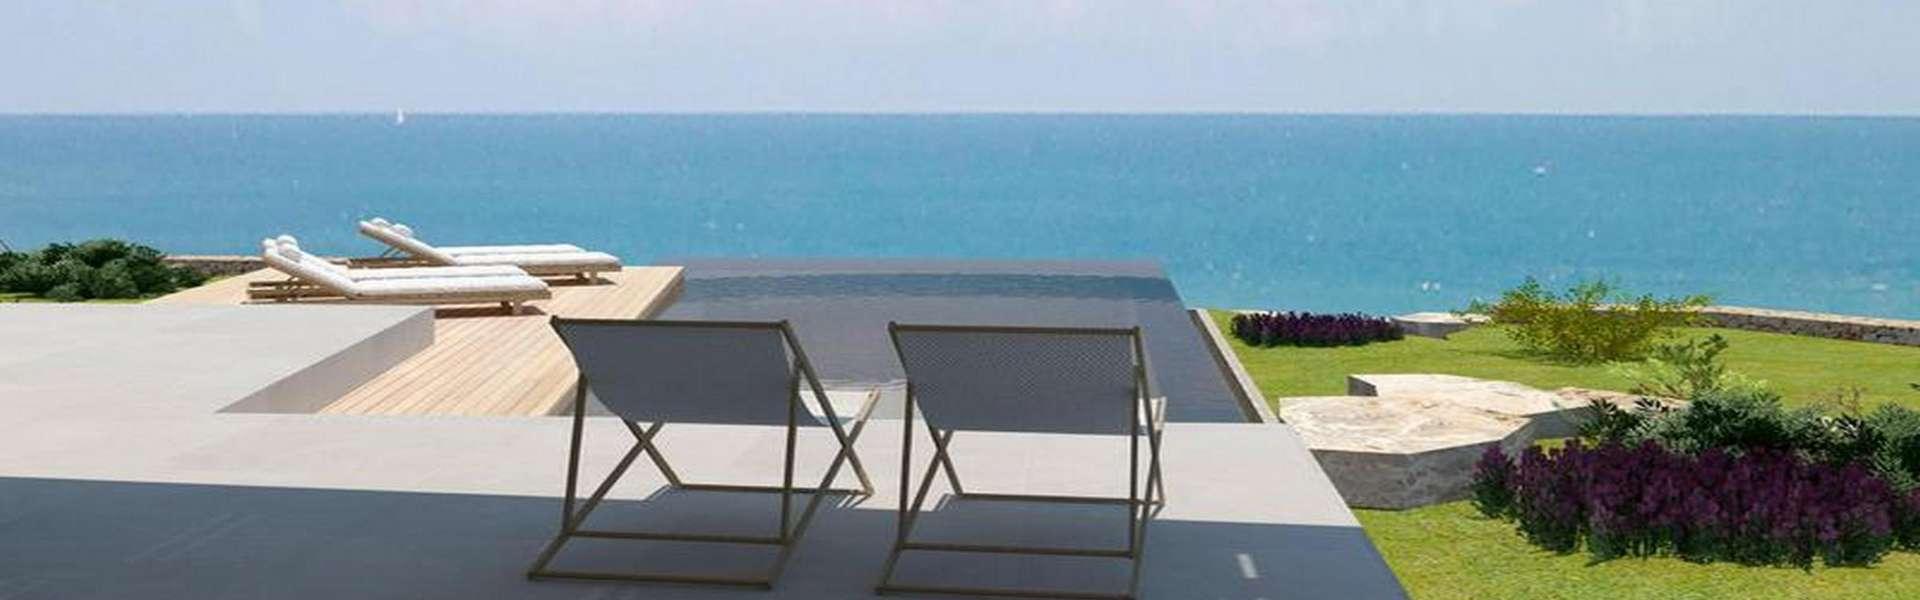 Cala d'Or - Grundstück mit Baugenehmigung in erster Meereslinie